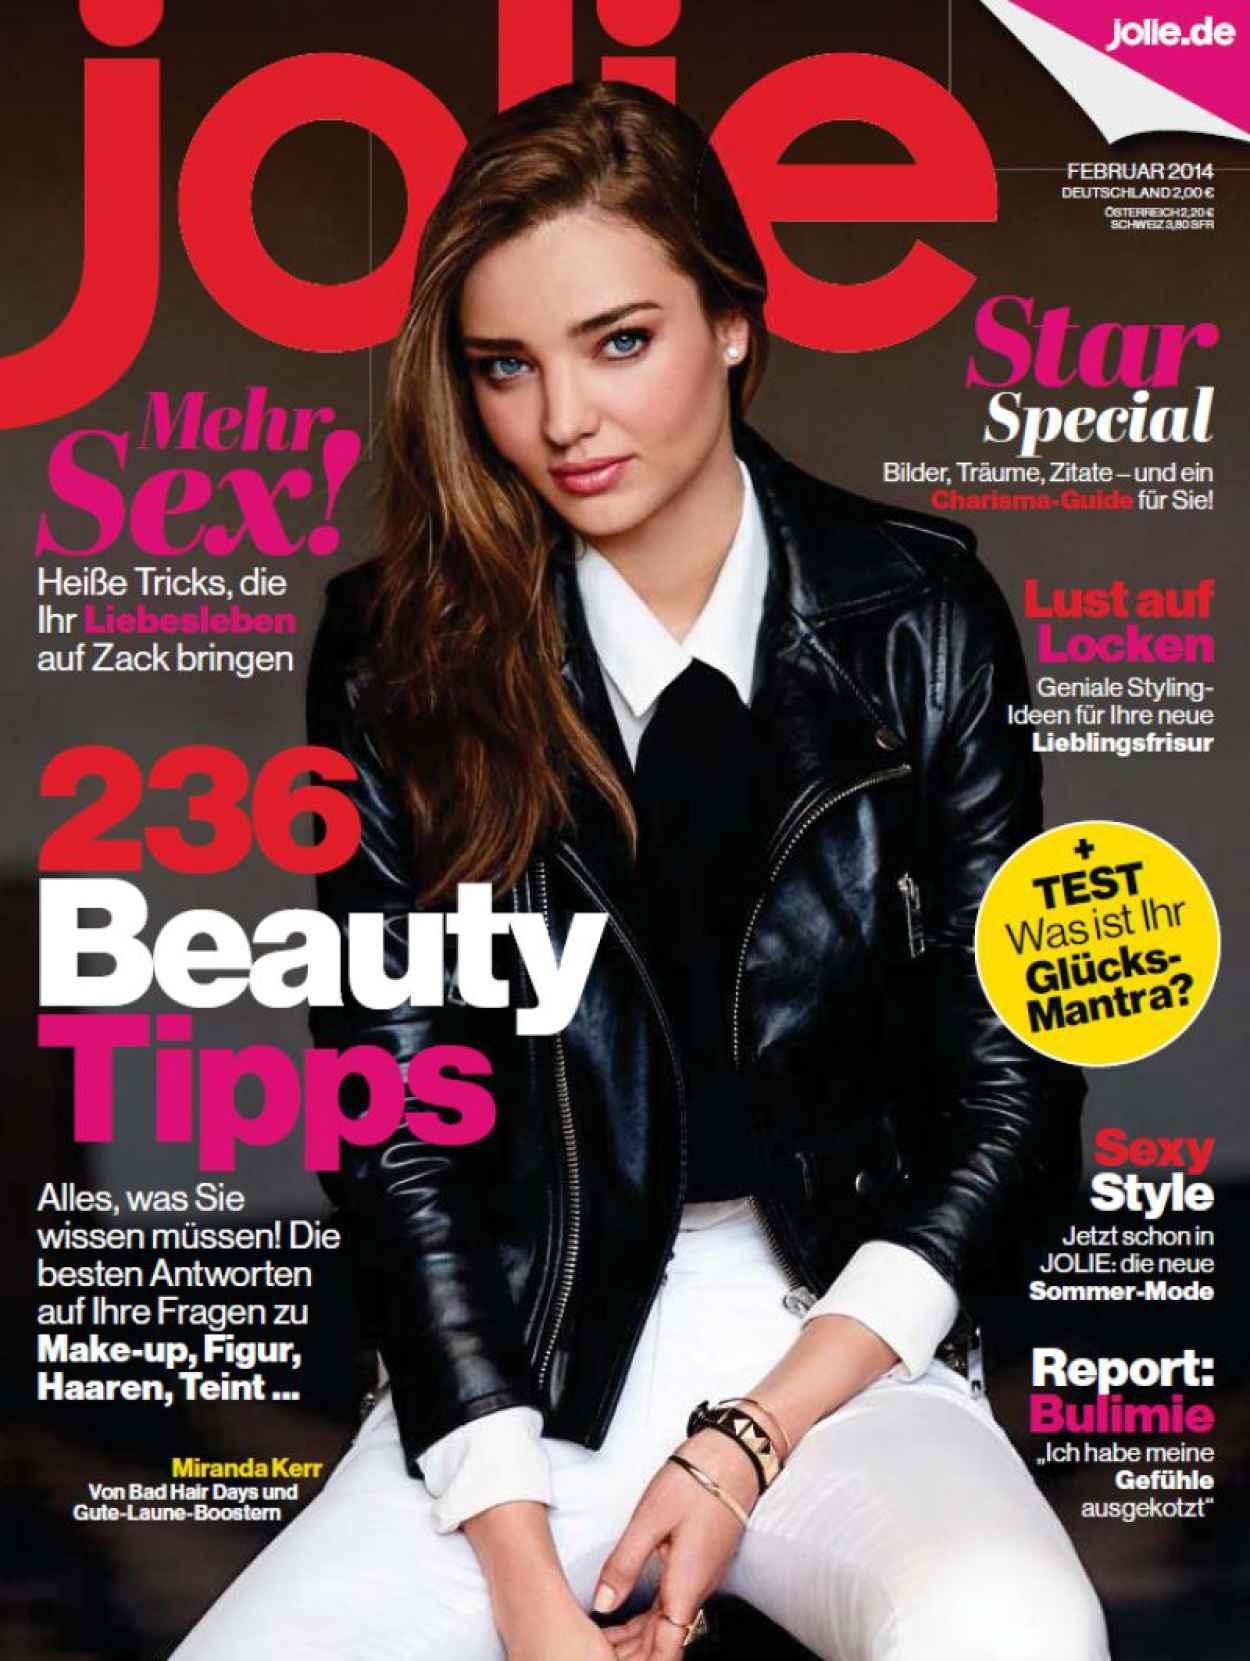 Miranda Kerr - JOLIE FRAUENMAGAZIN Magazine - February 2015 Issue-1